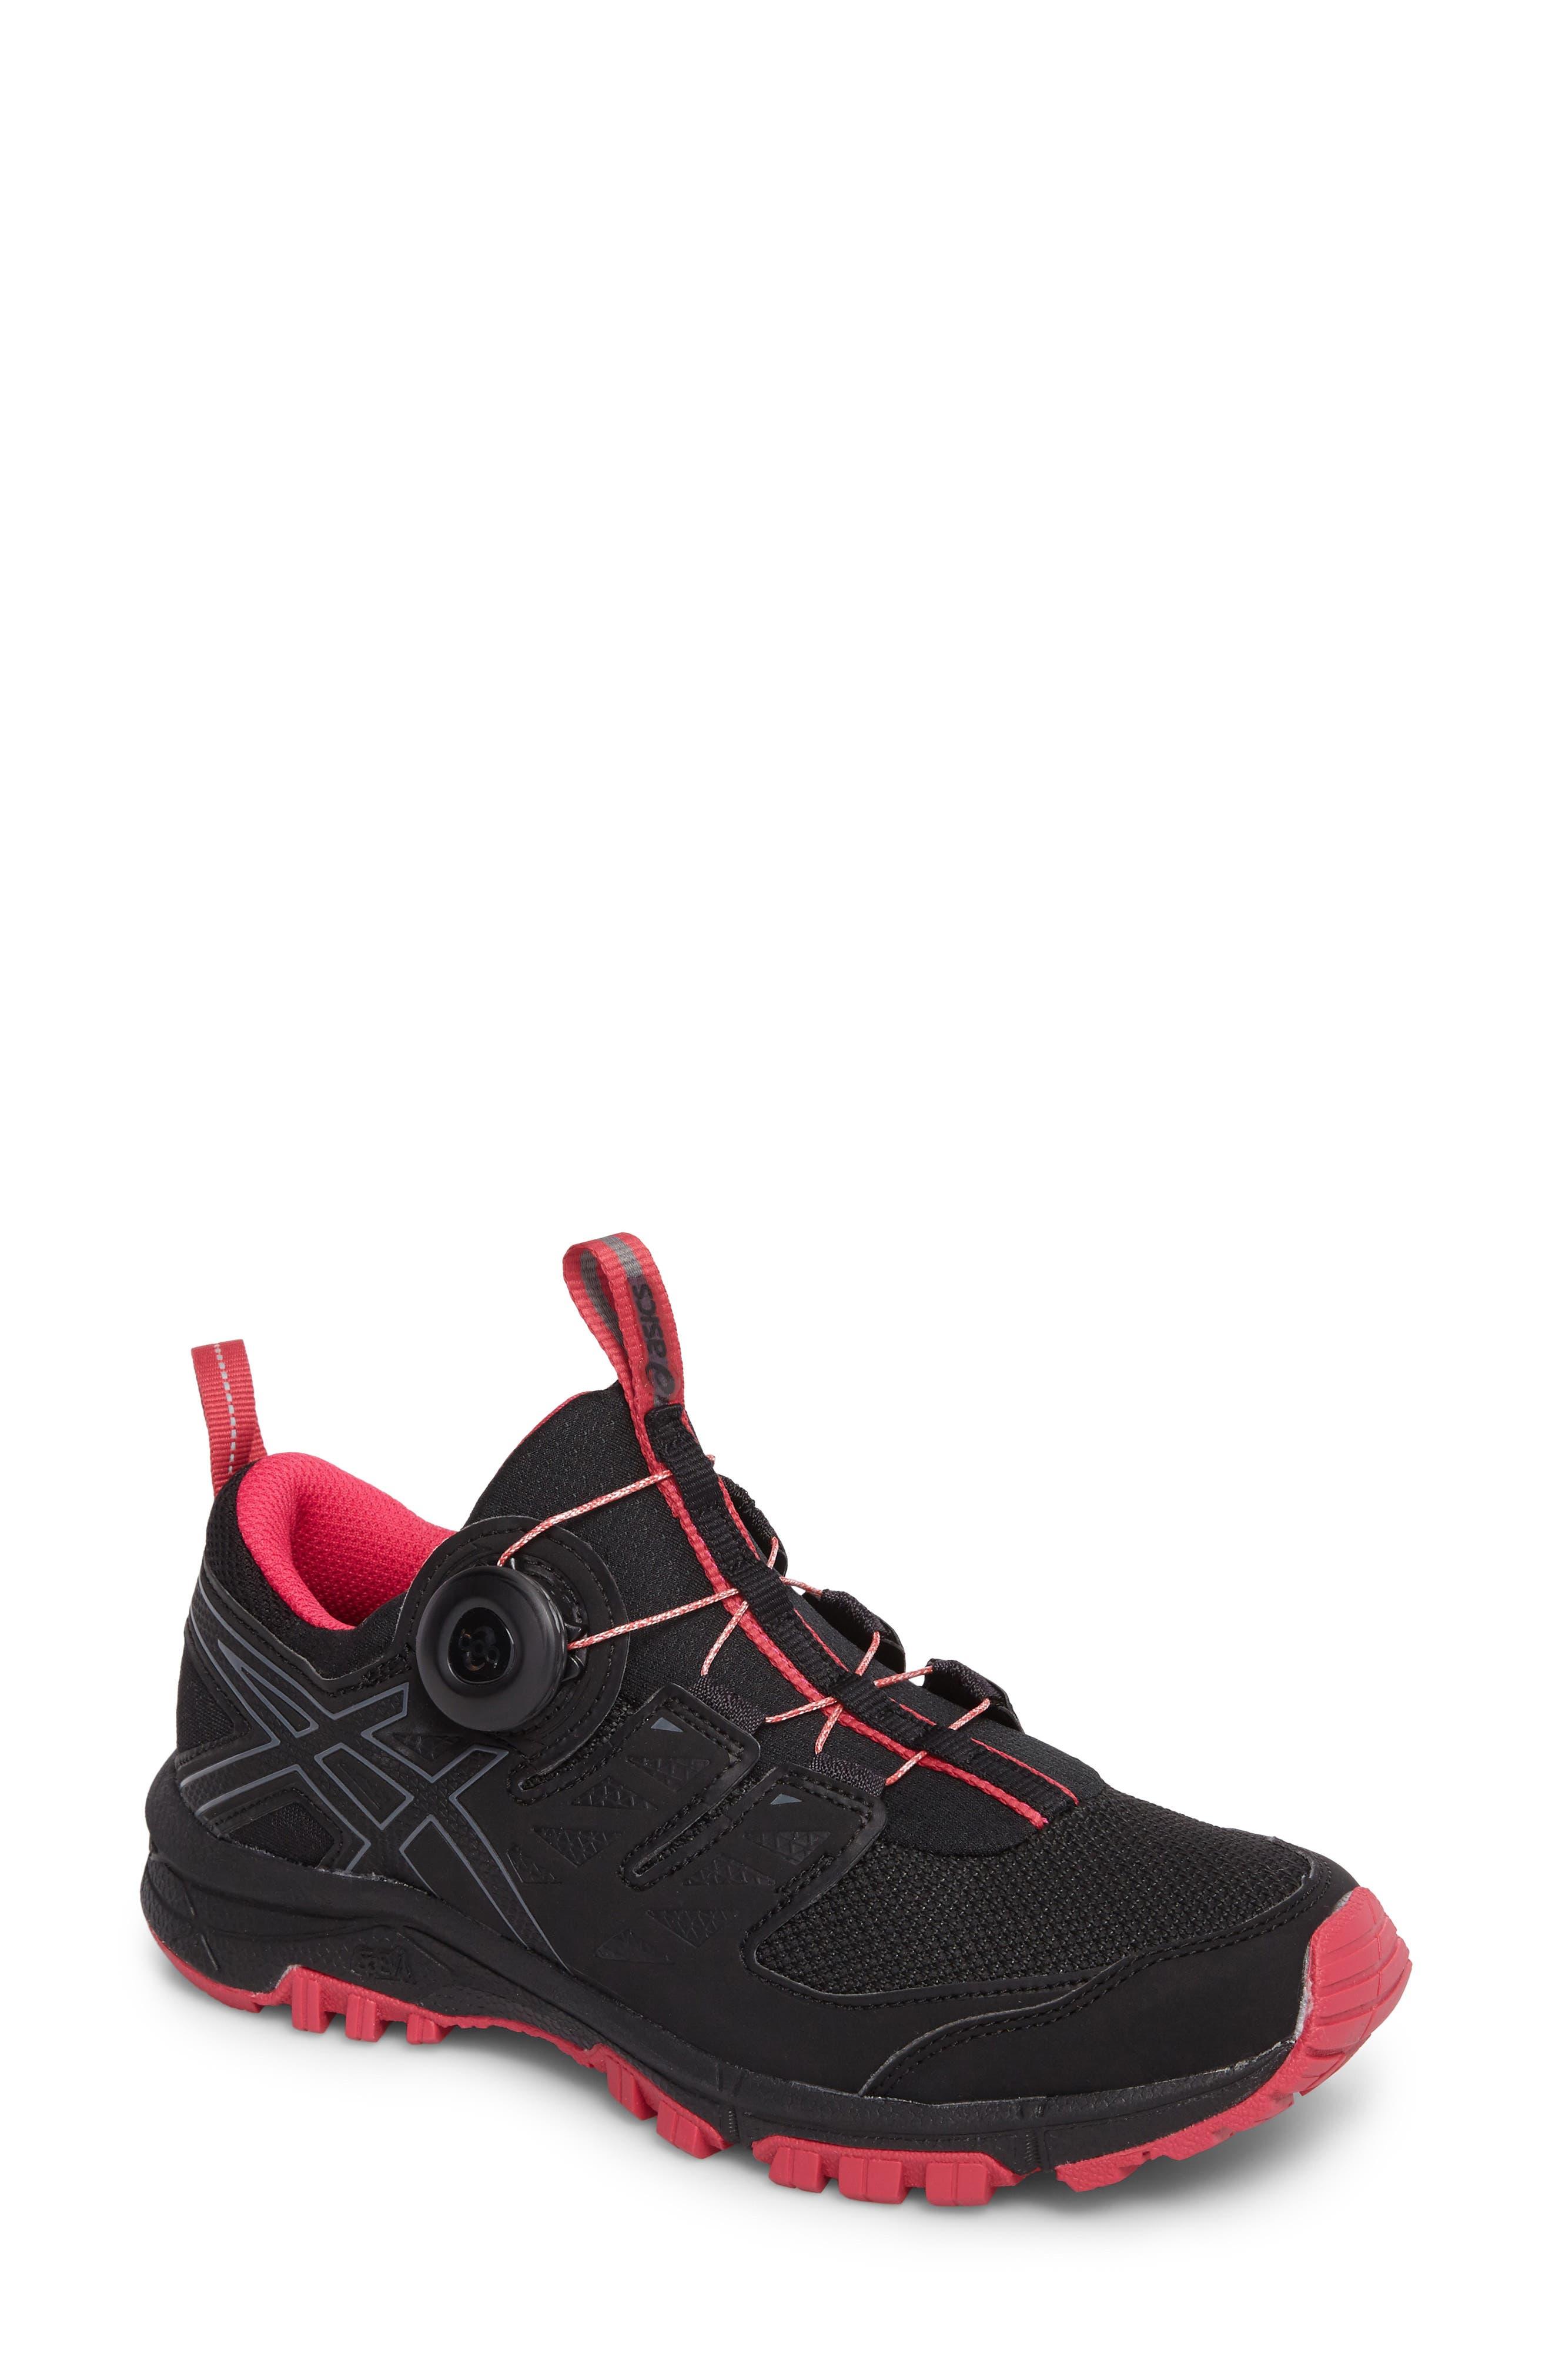 GEL-Fujirado Running Shoe,                             Main thumbnail 1, color,                             Black/ Carbon/ Cosmo Pink